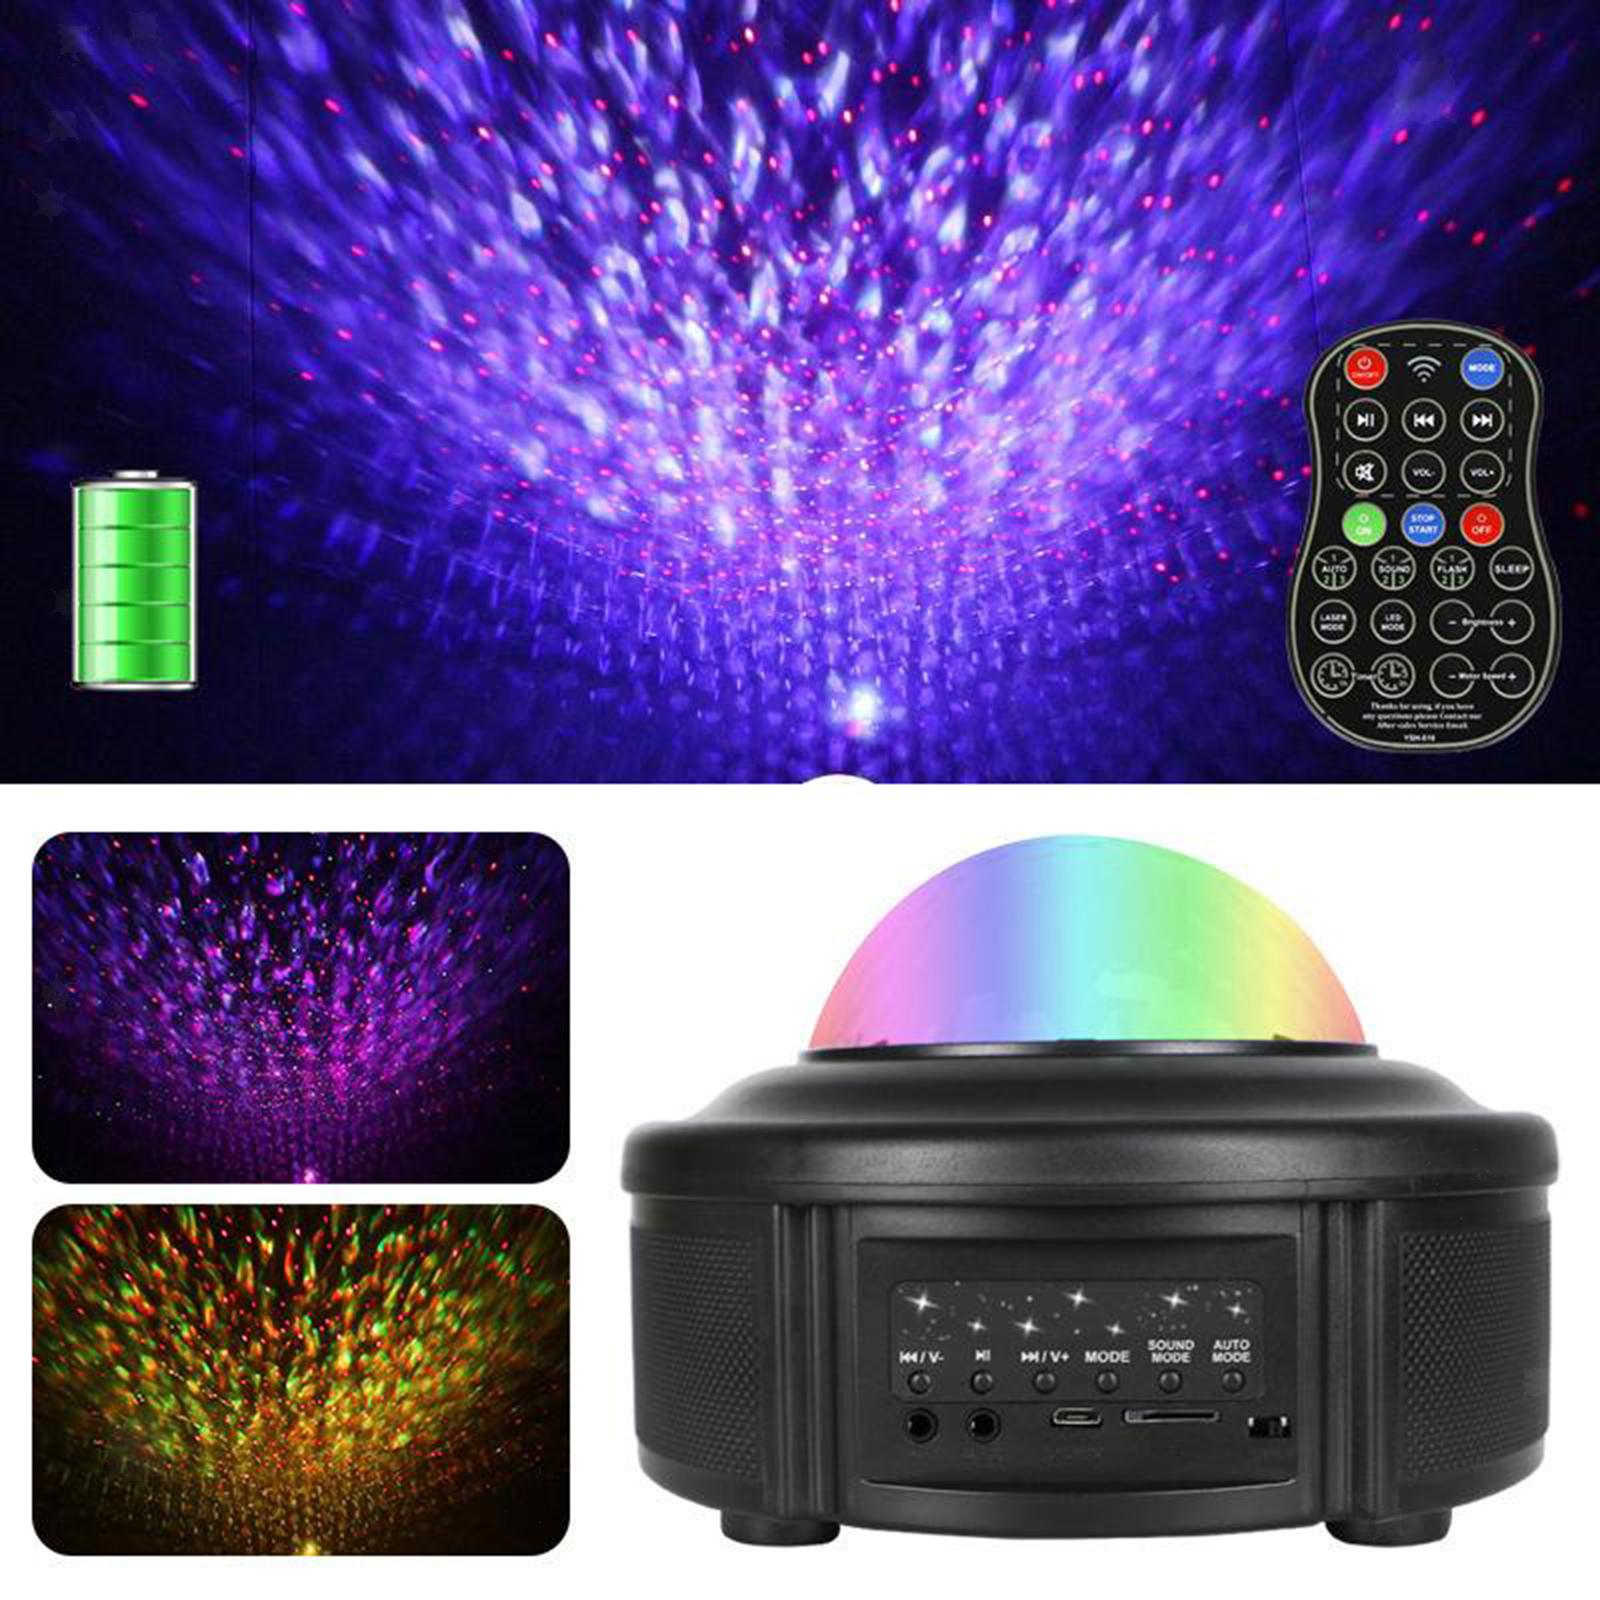 miniatura 3 - Bluetooth-LED-Galaxy-Proiettore-Lampada-notturna-stellata-Luce-notturna-a